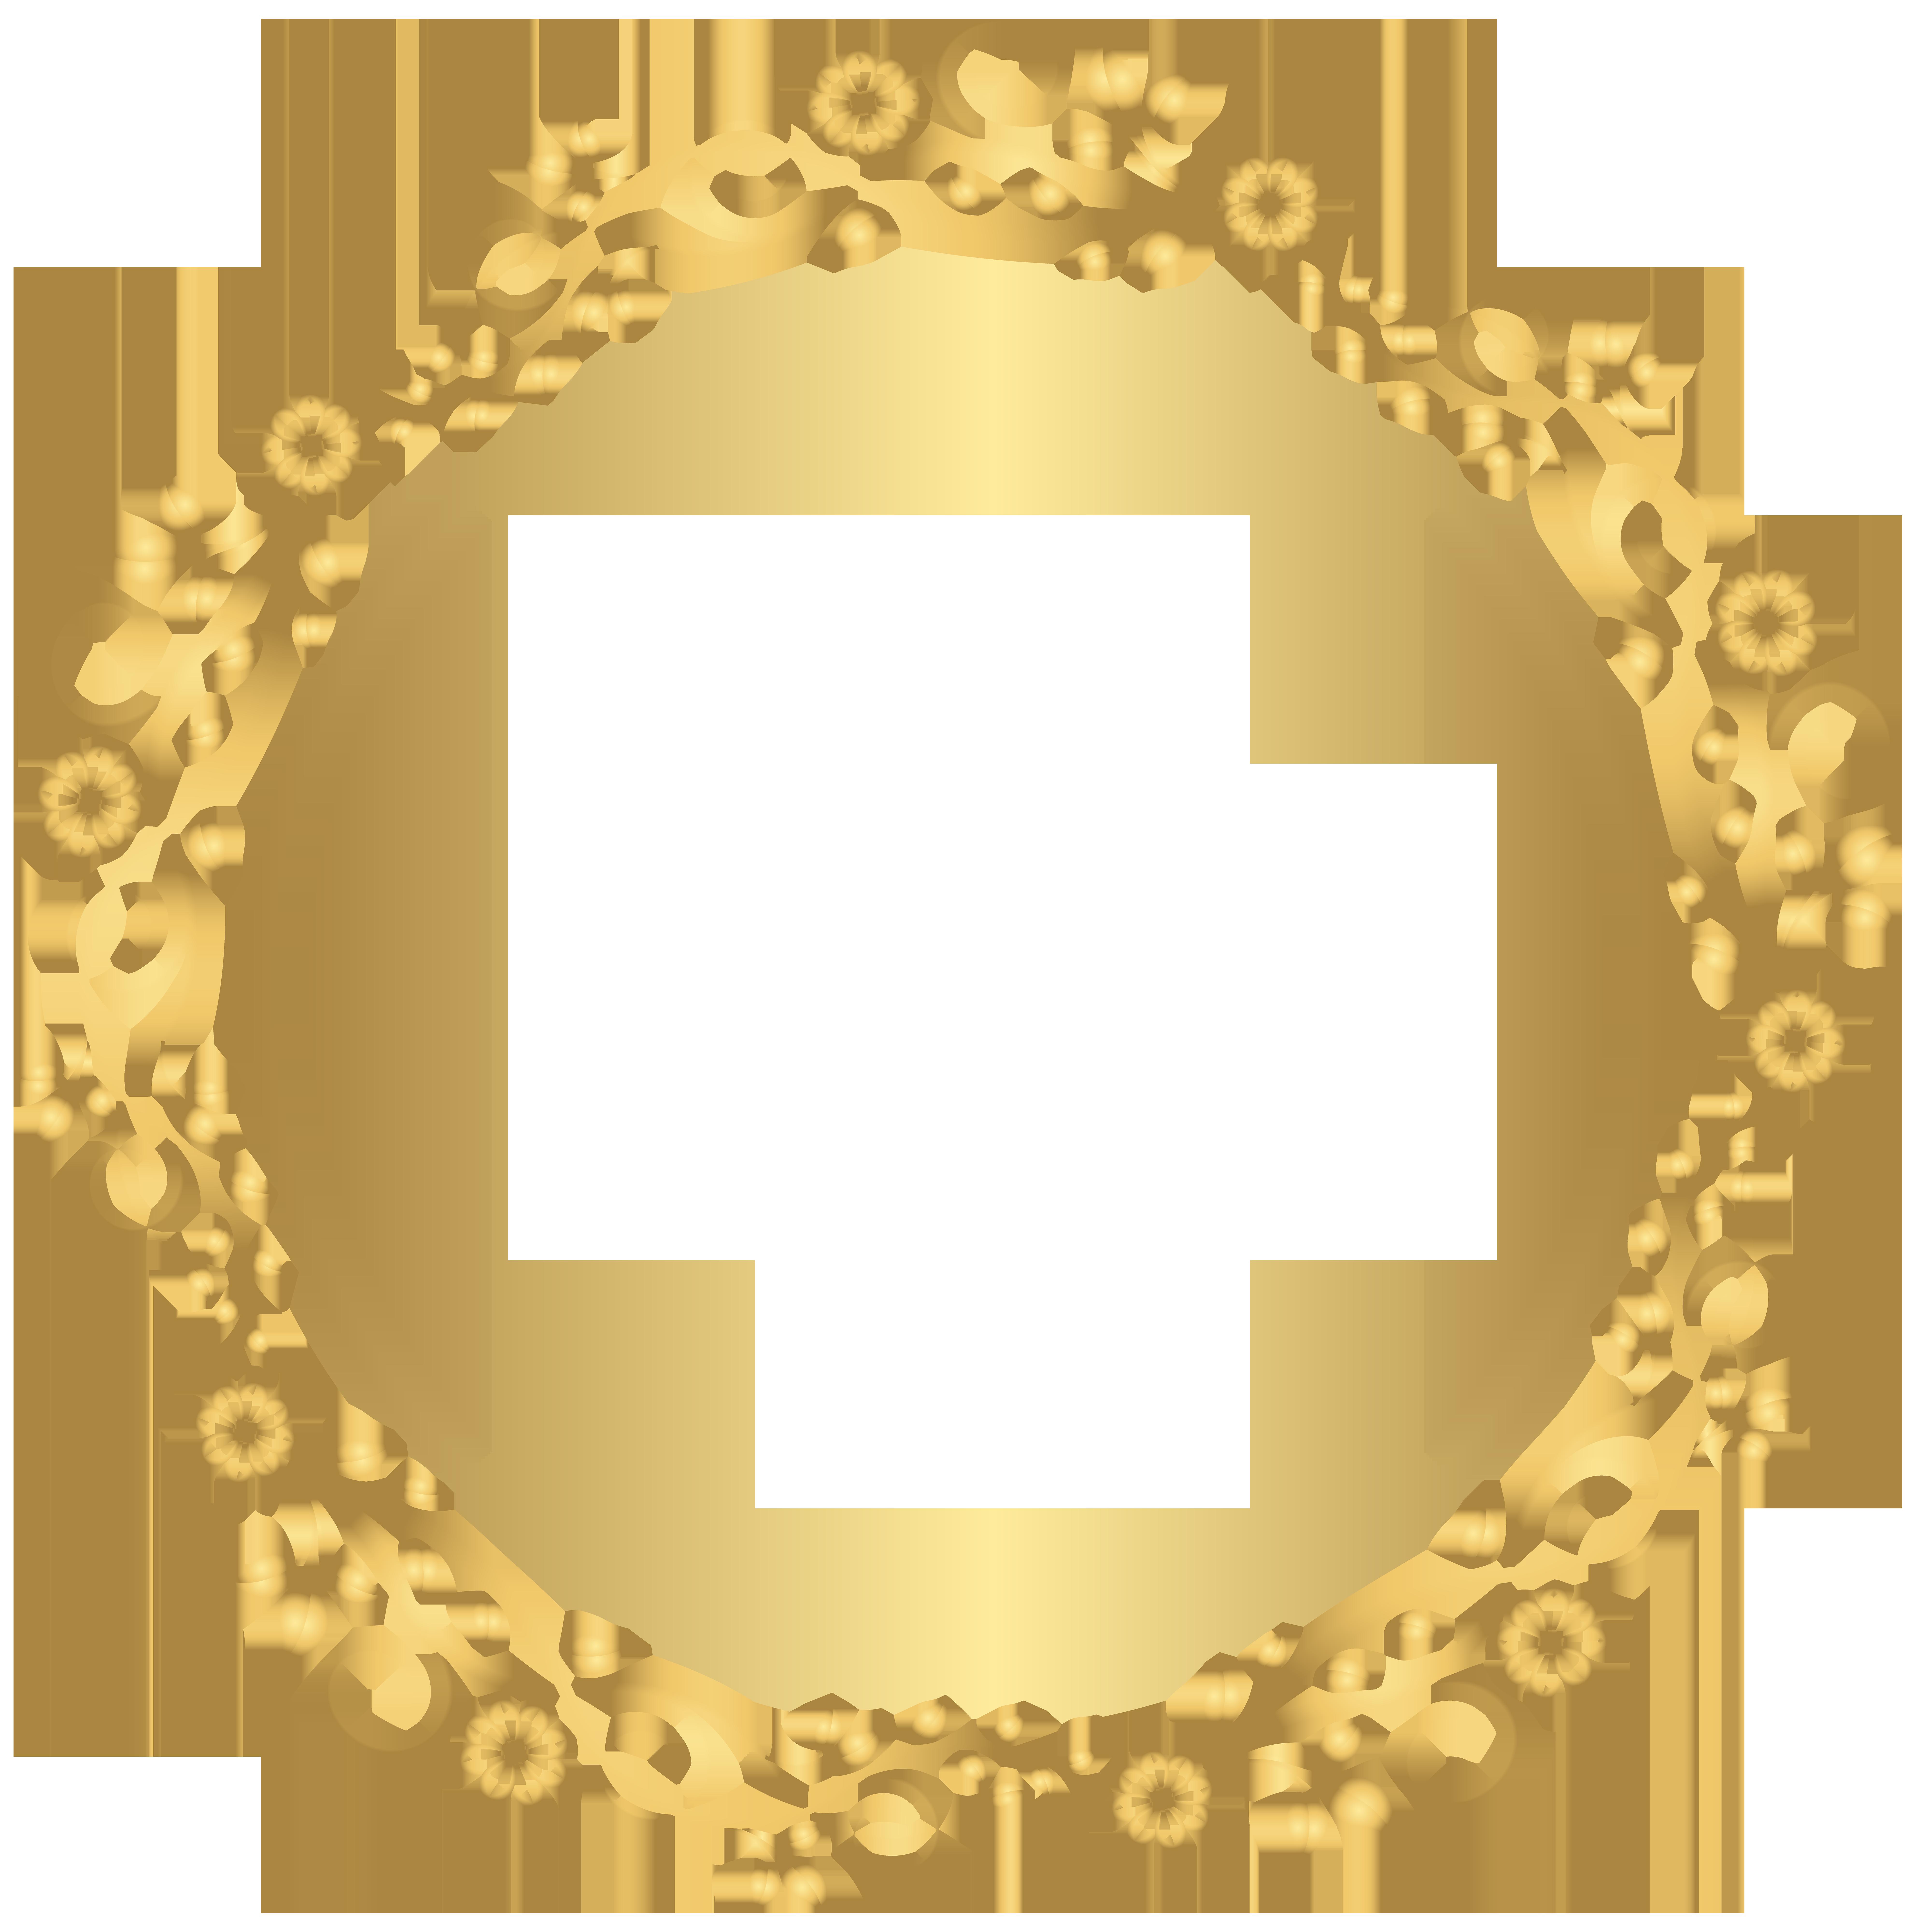 7976x8000 Gold Round Floral Border Transparent Png Clip Art Image